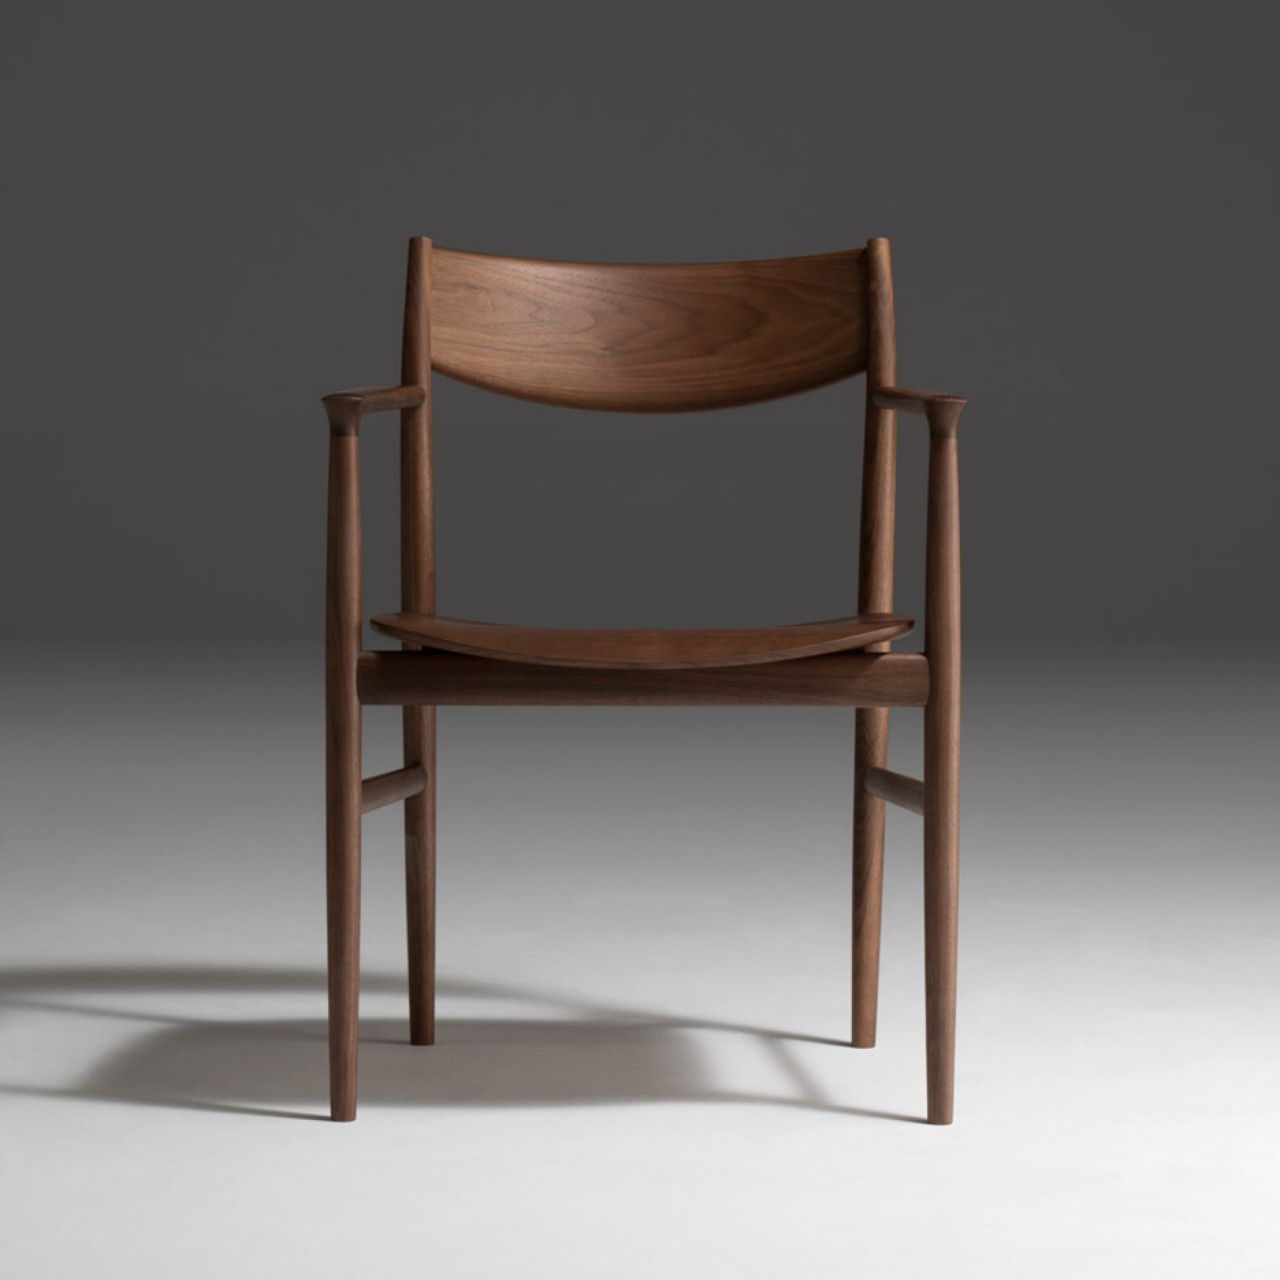 Pin de Brett Manson en Furniture - Chairs | Pinterest | Sillas ...